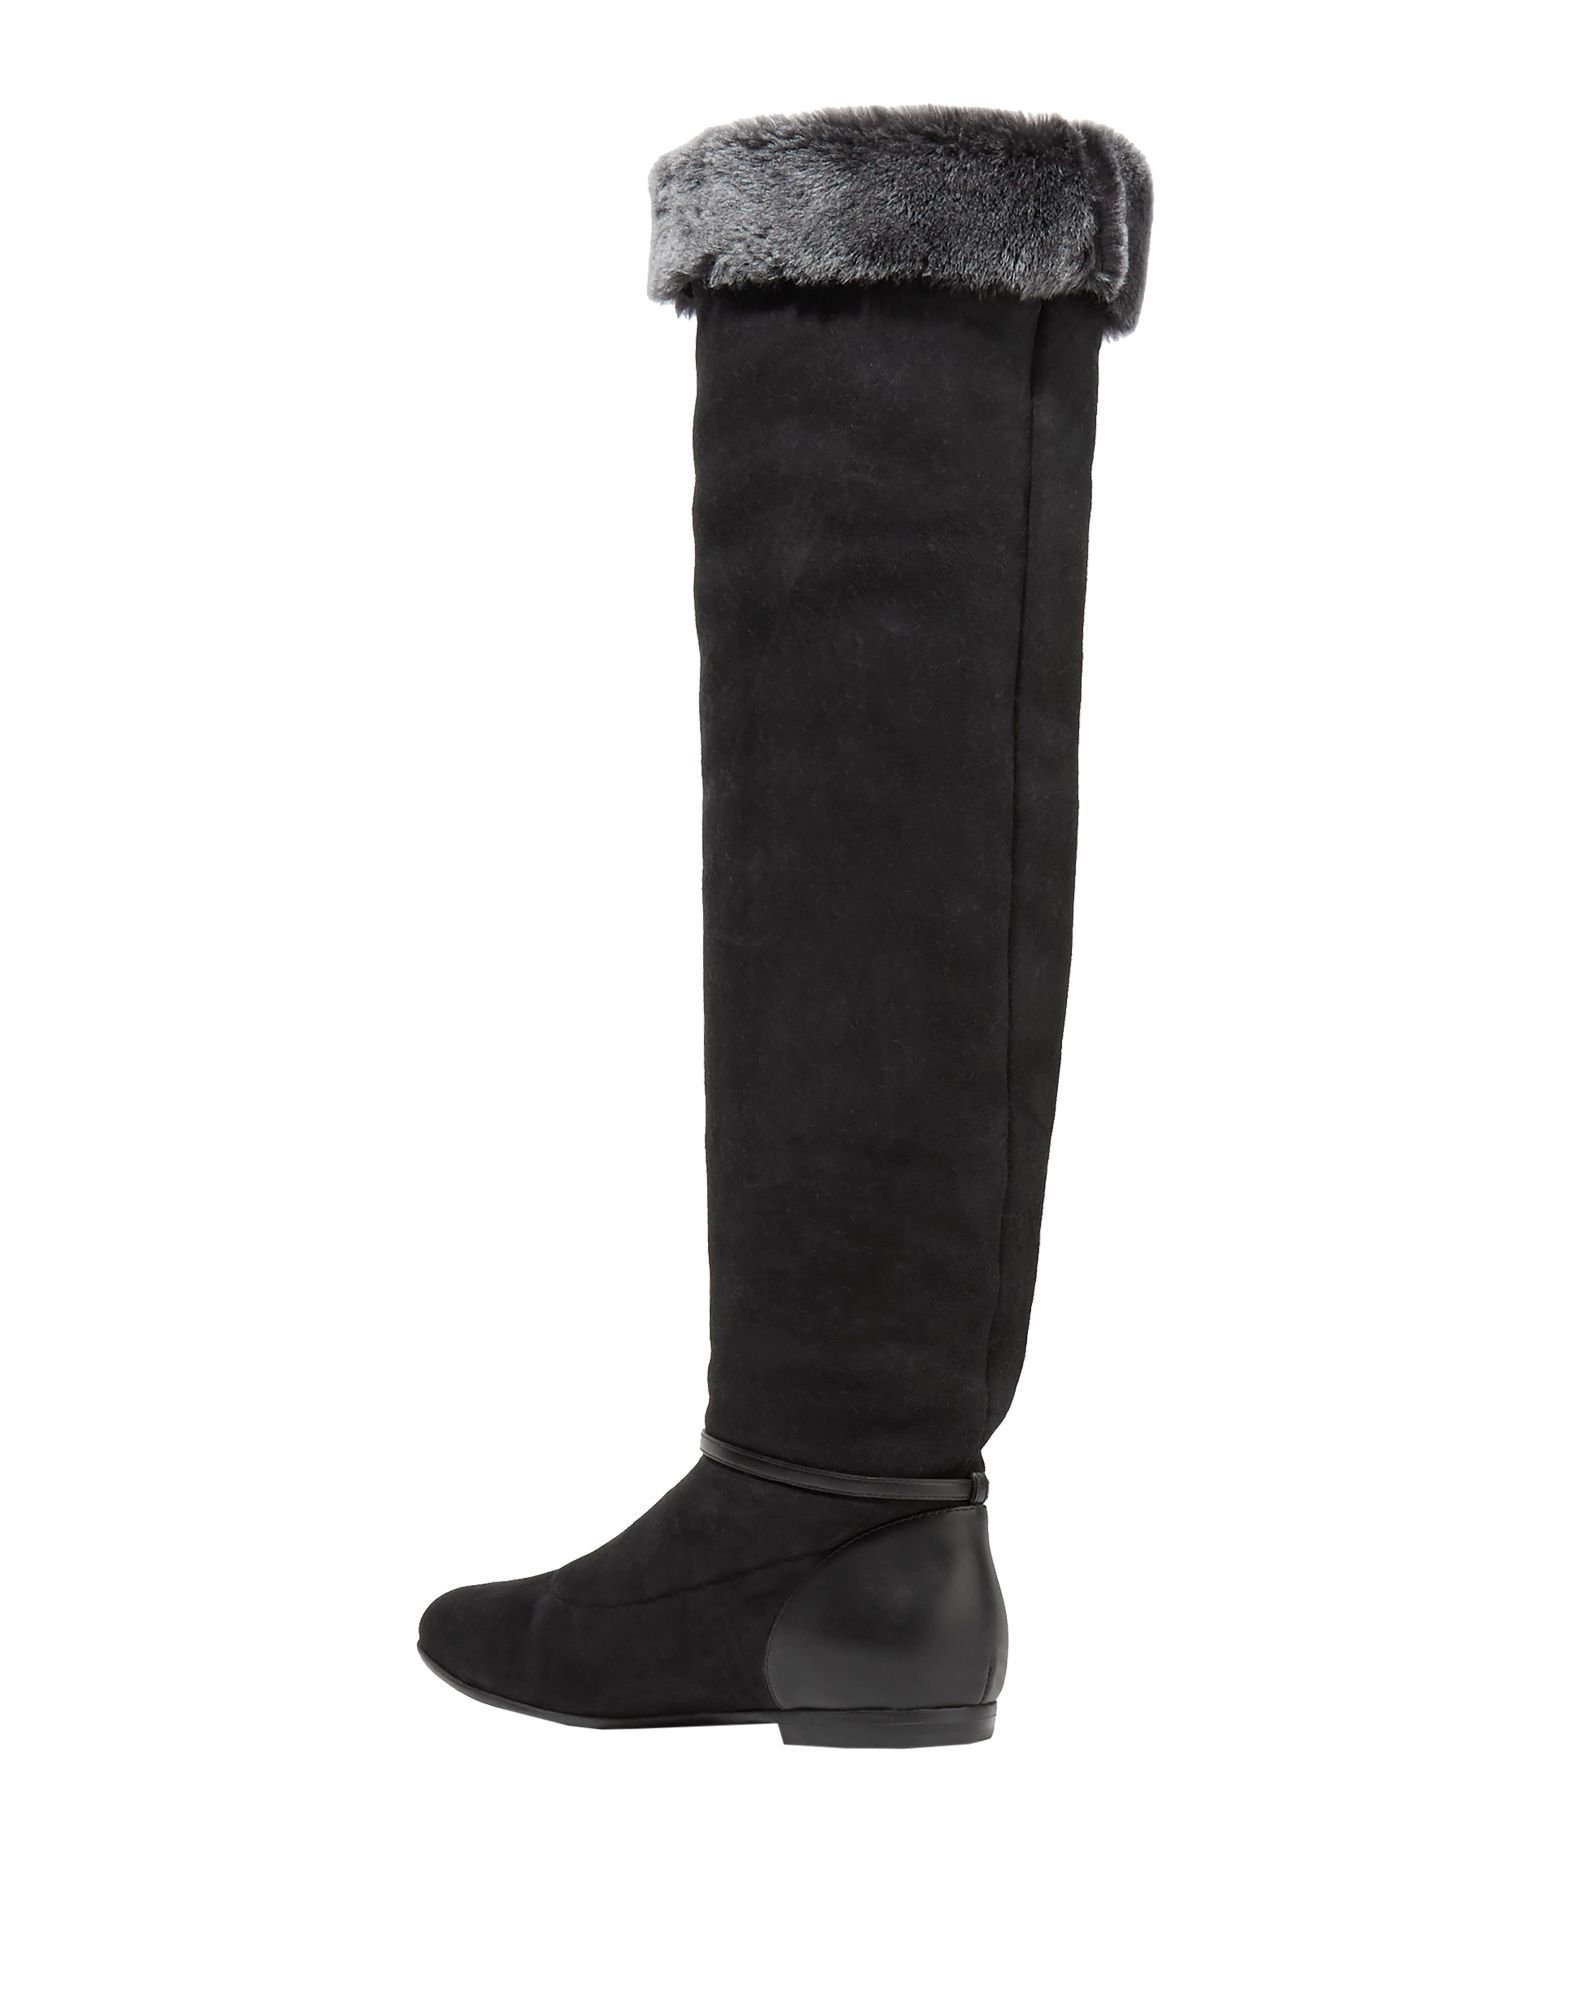 FOOTWEAR Giuseppe Zanotti Black Woman Leather